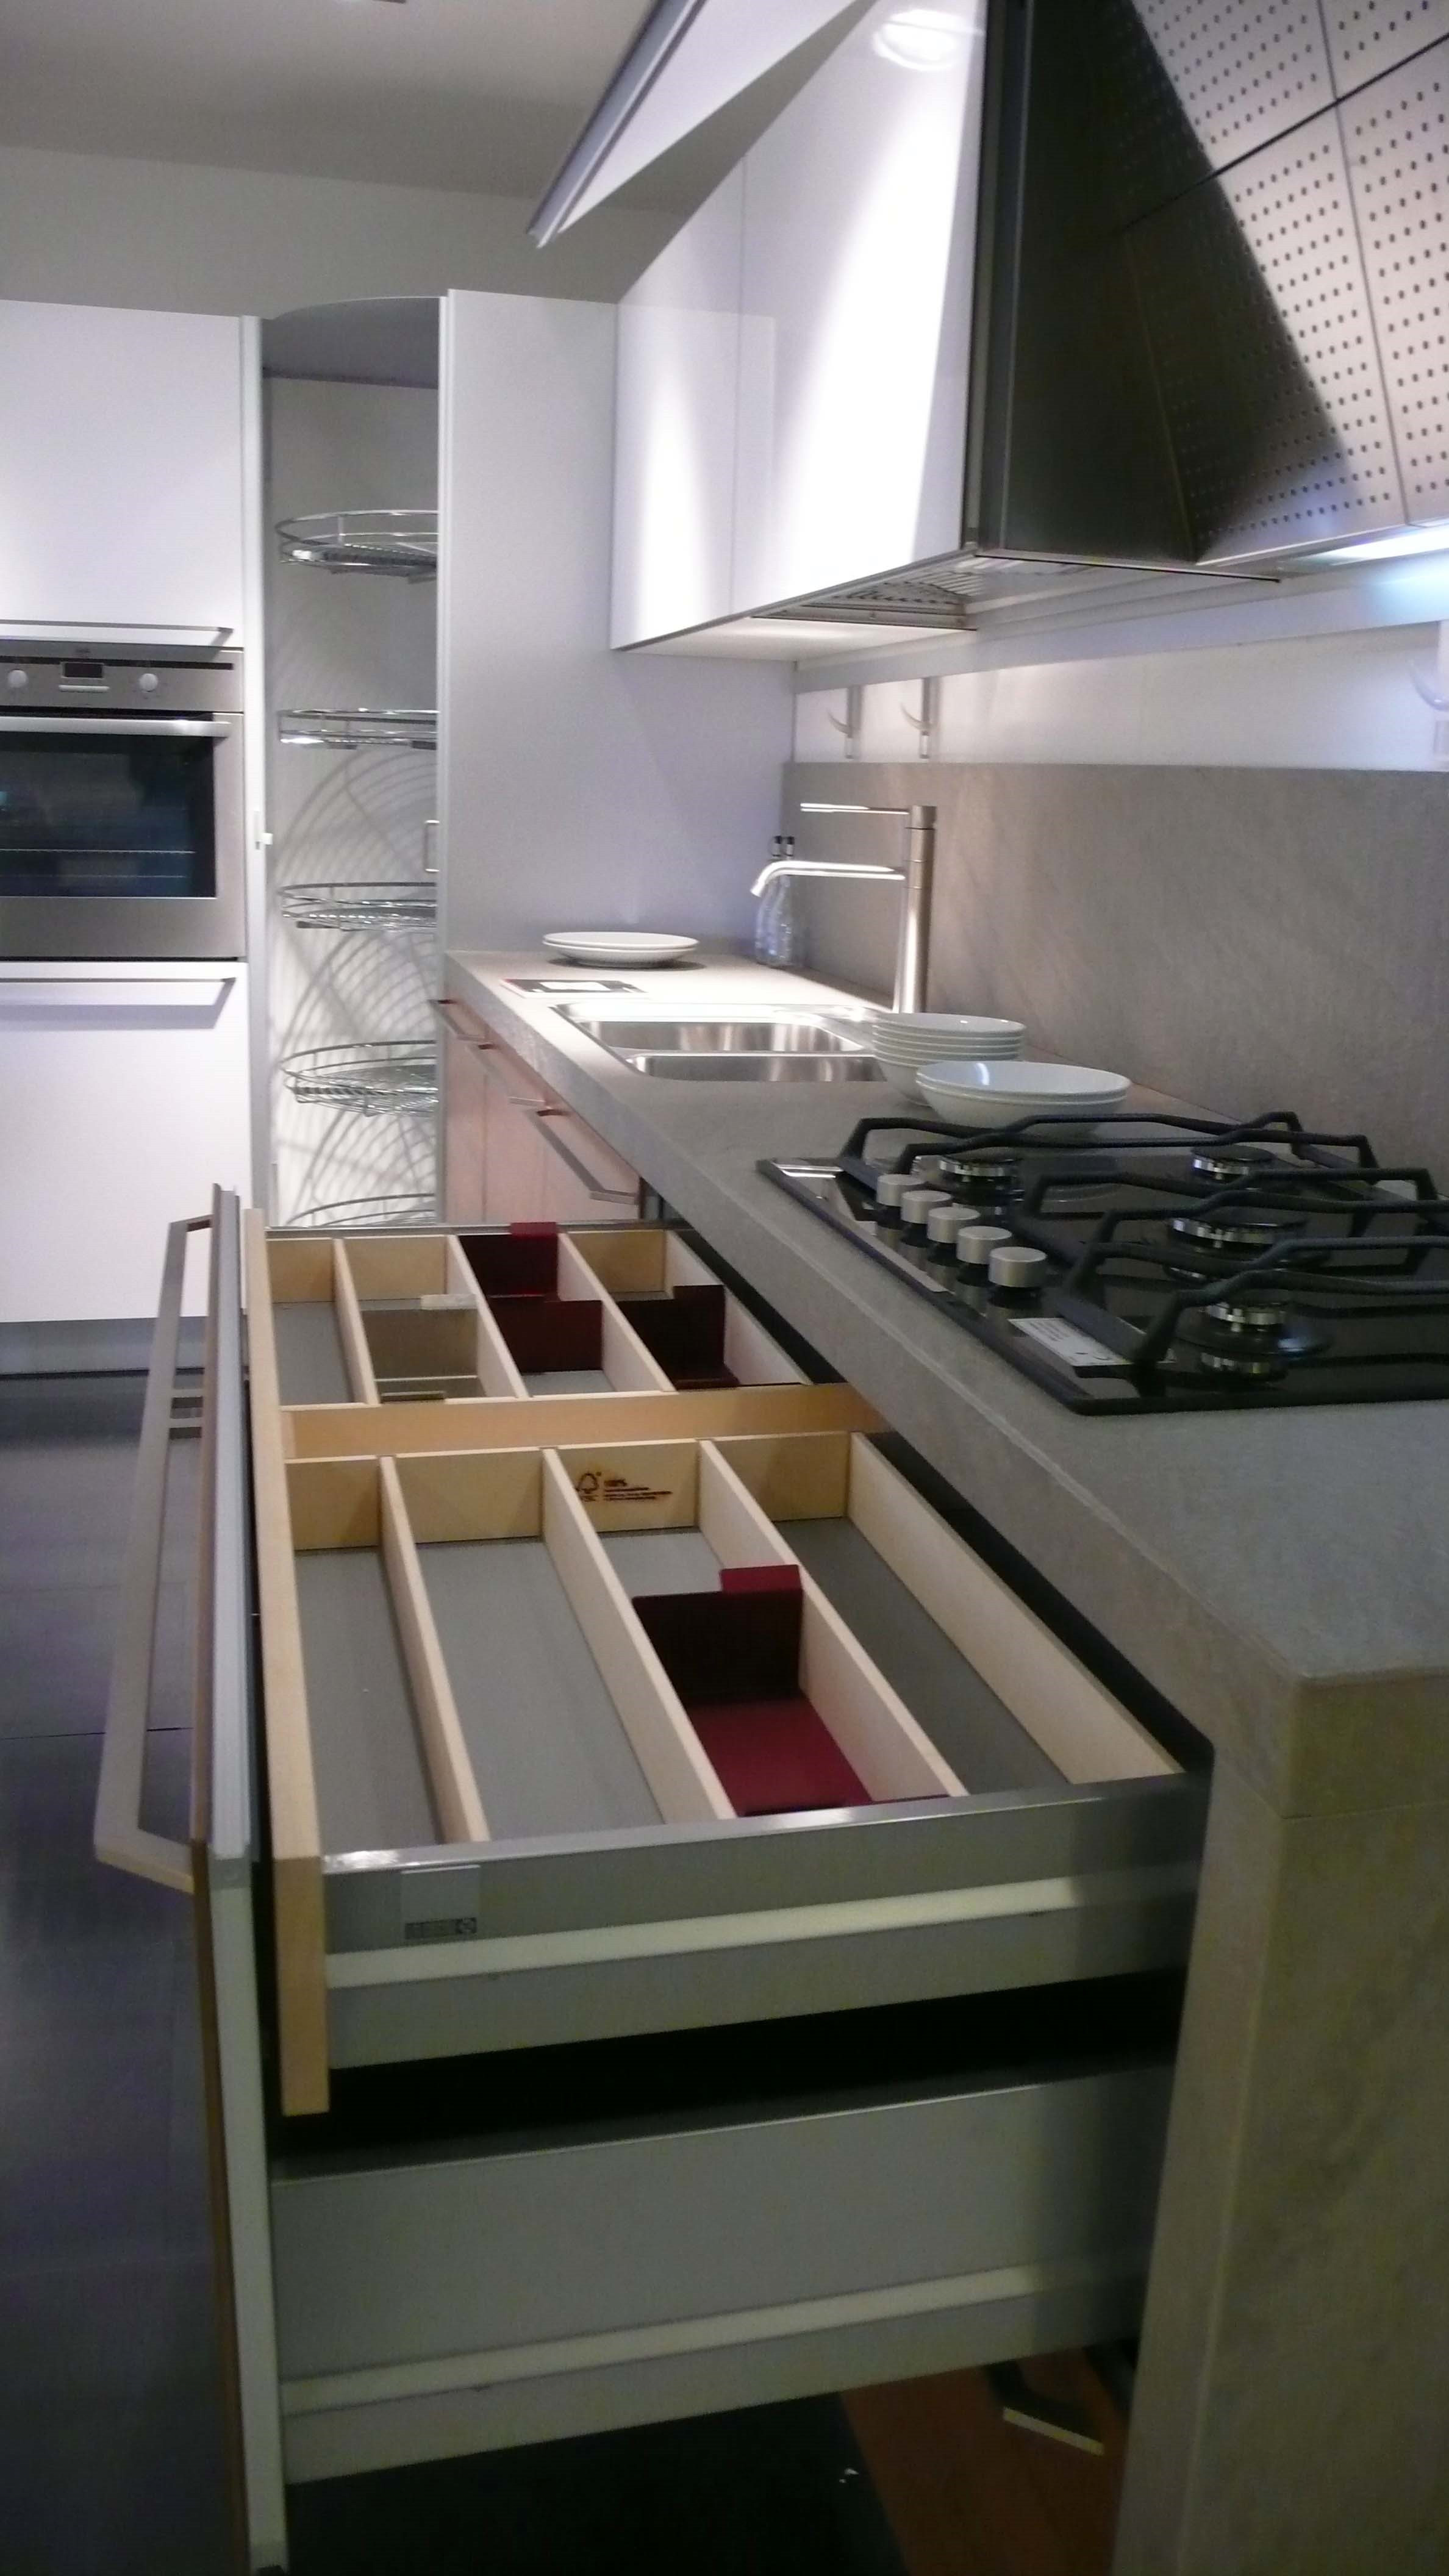 Awesome prezzi cucine valcucine images acrylicgiftware - Cucine valcucine opinioni ...